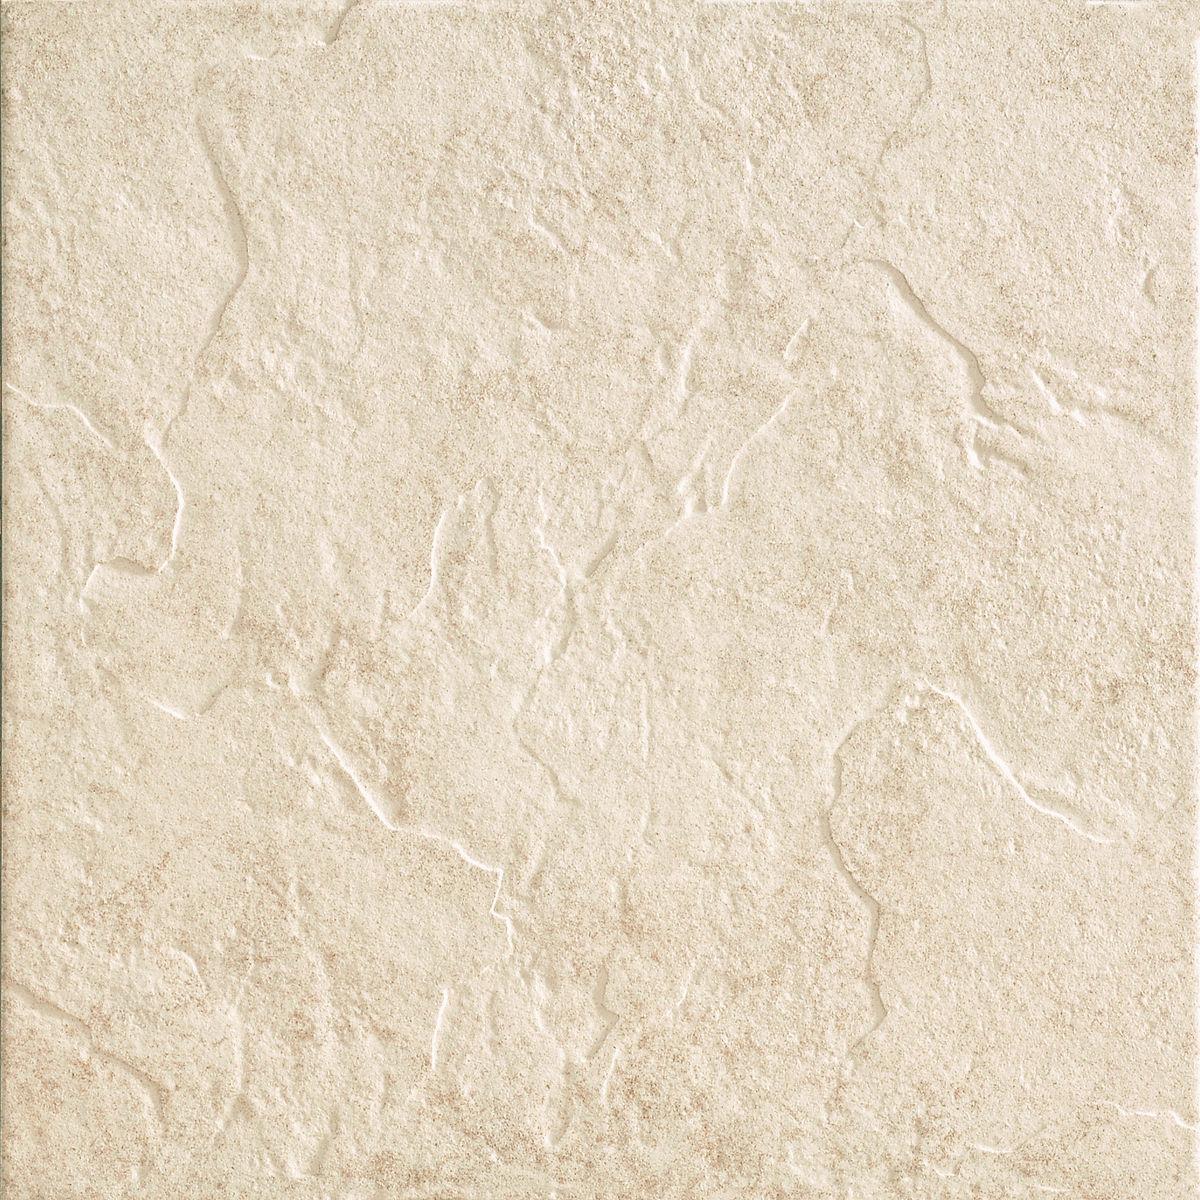 Керамогранит Zeus Ceramica (Зевс Керамика) CP80